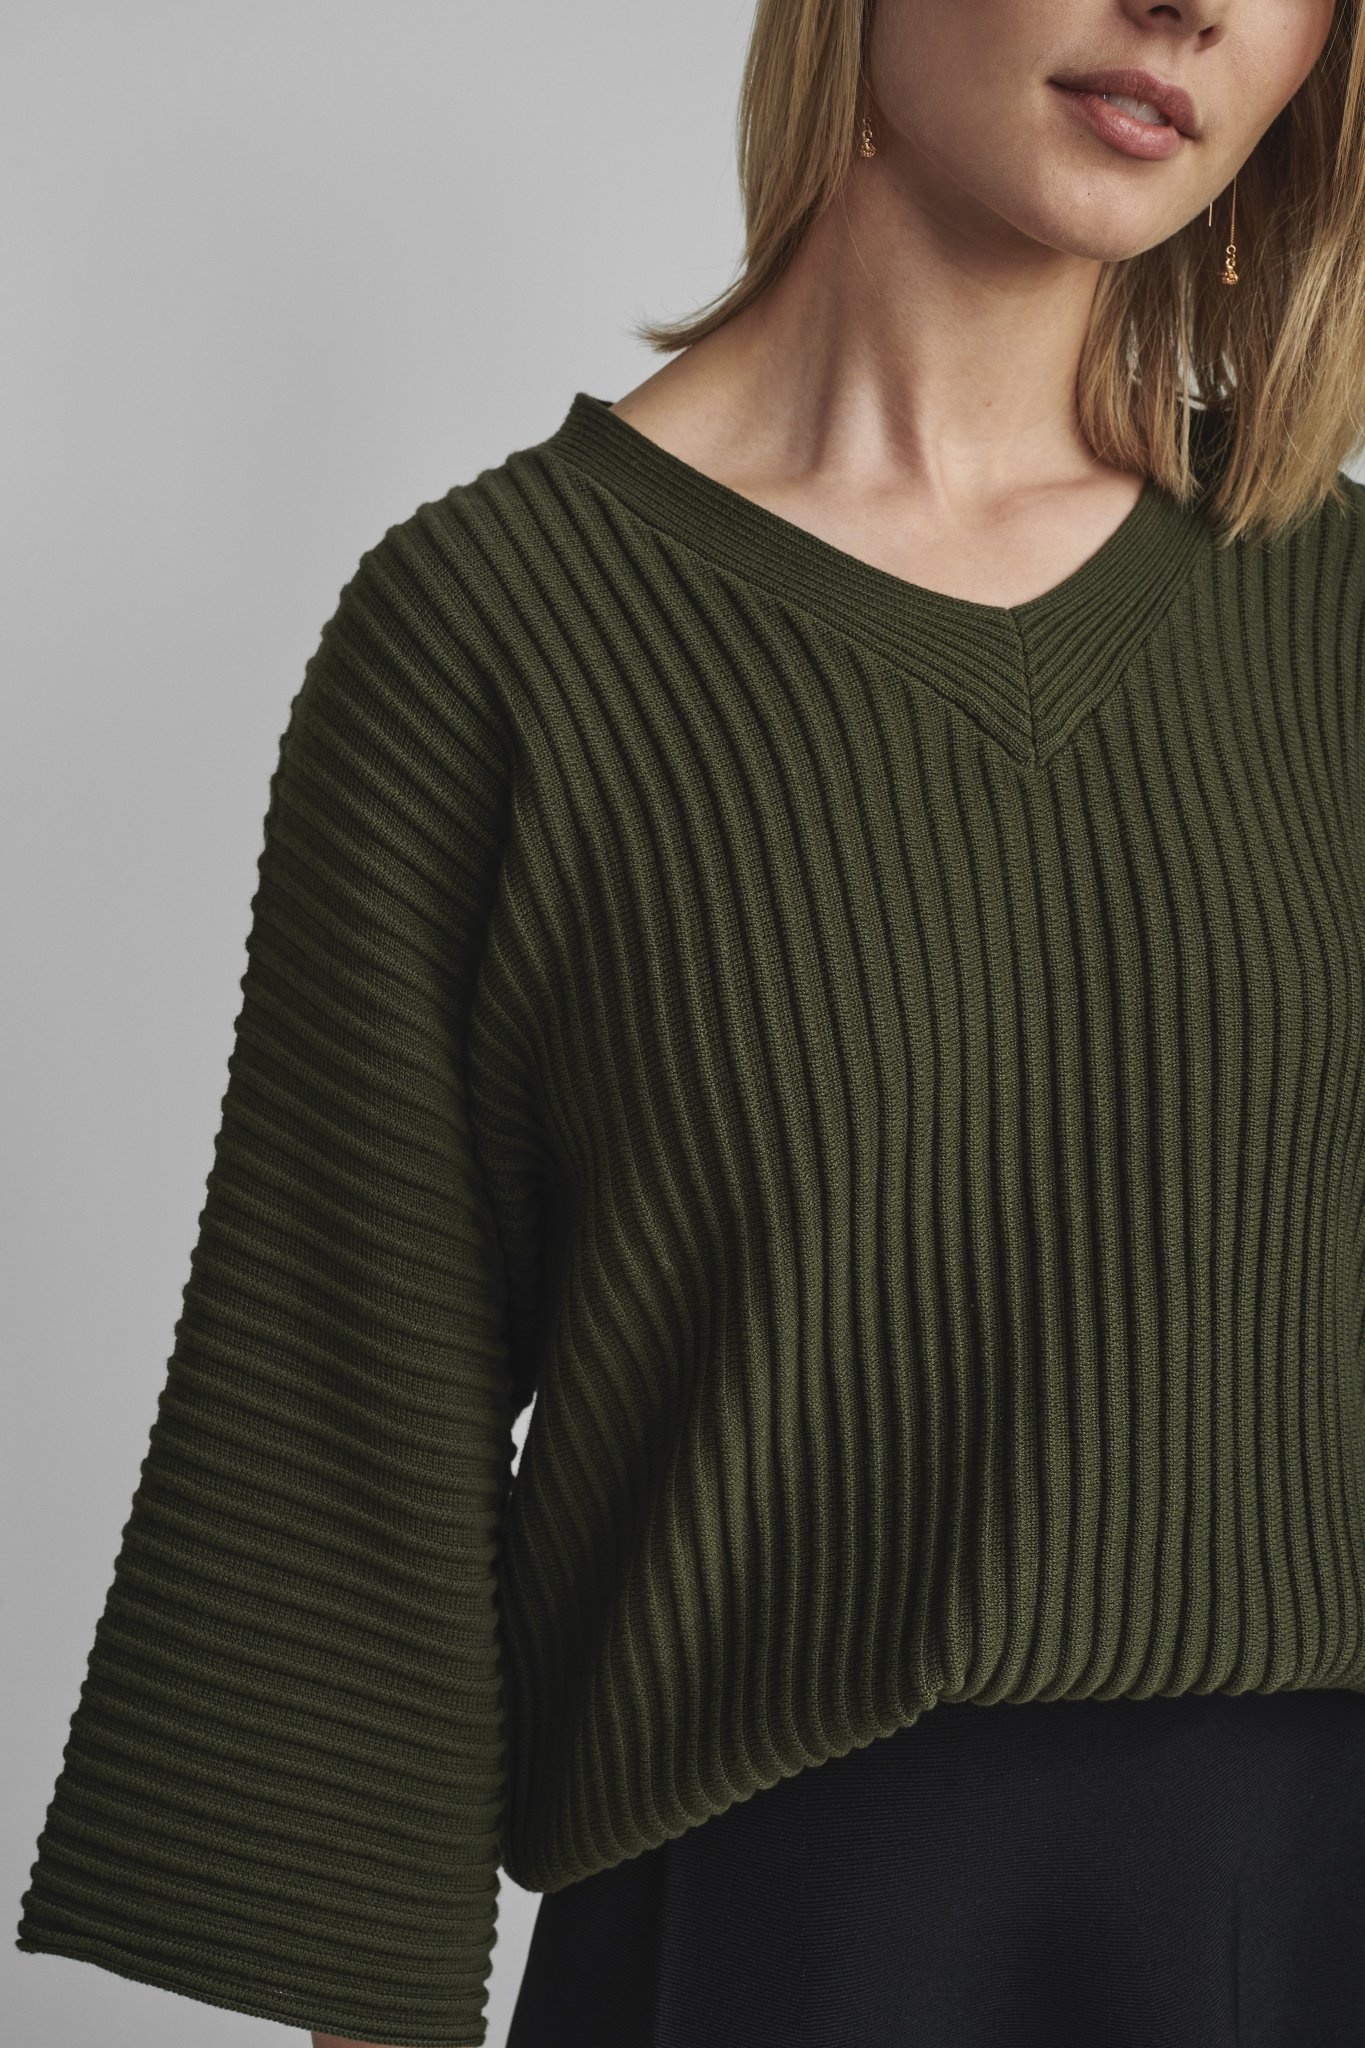 Nümph Irmelin V-neck Pullover - NOOS - Kaki